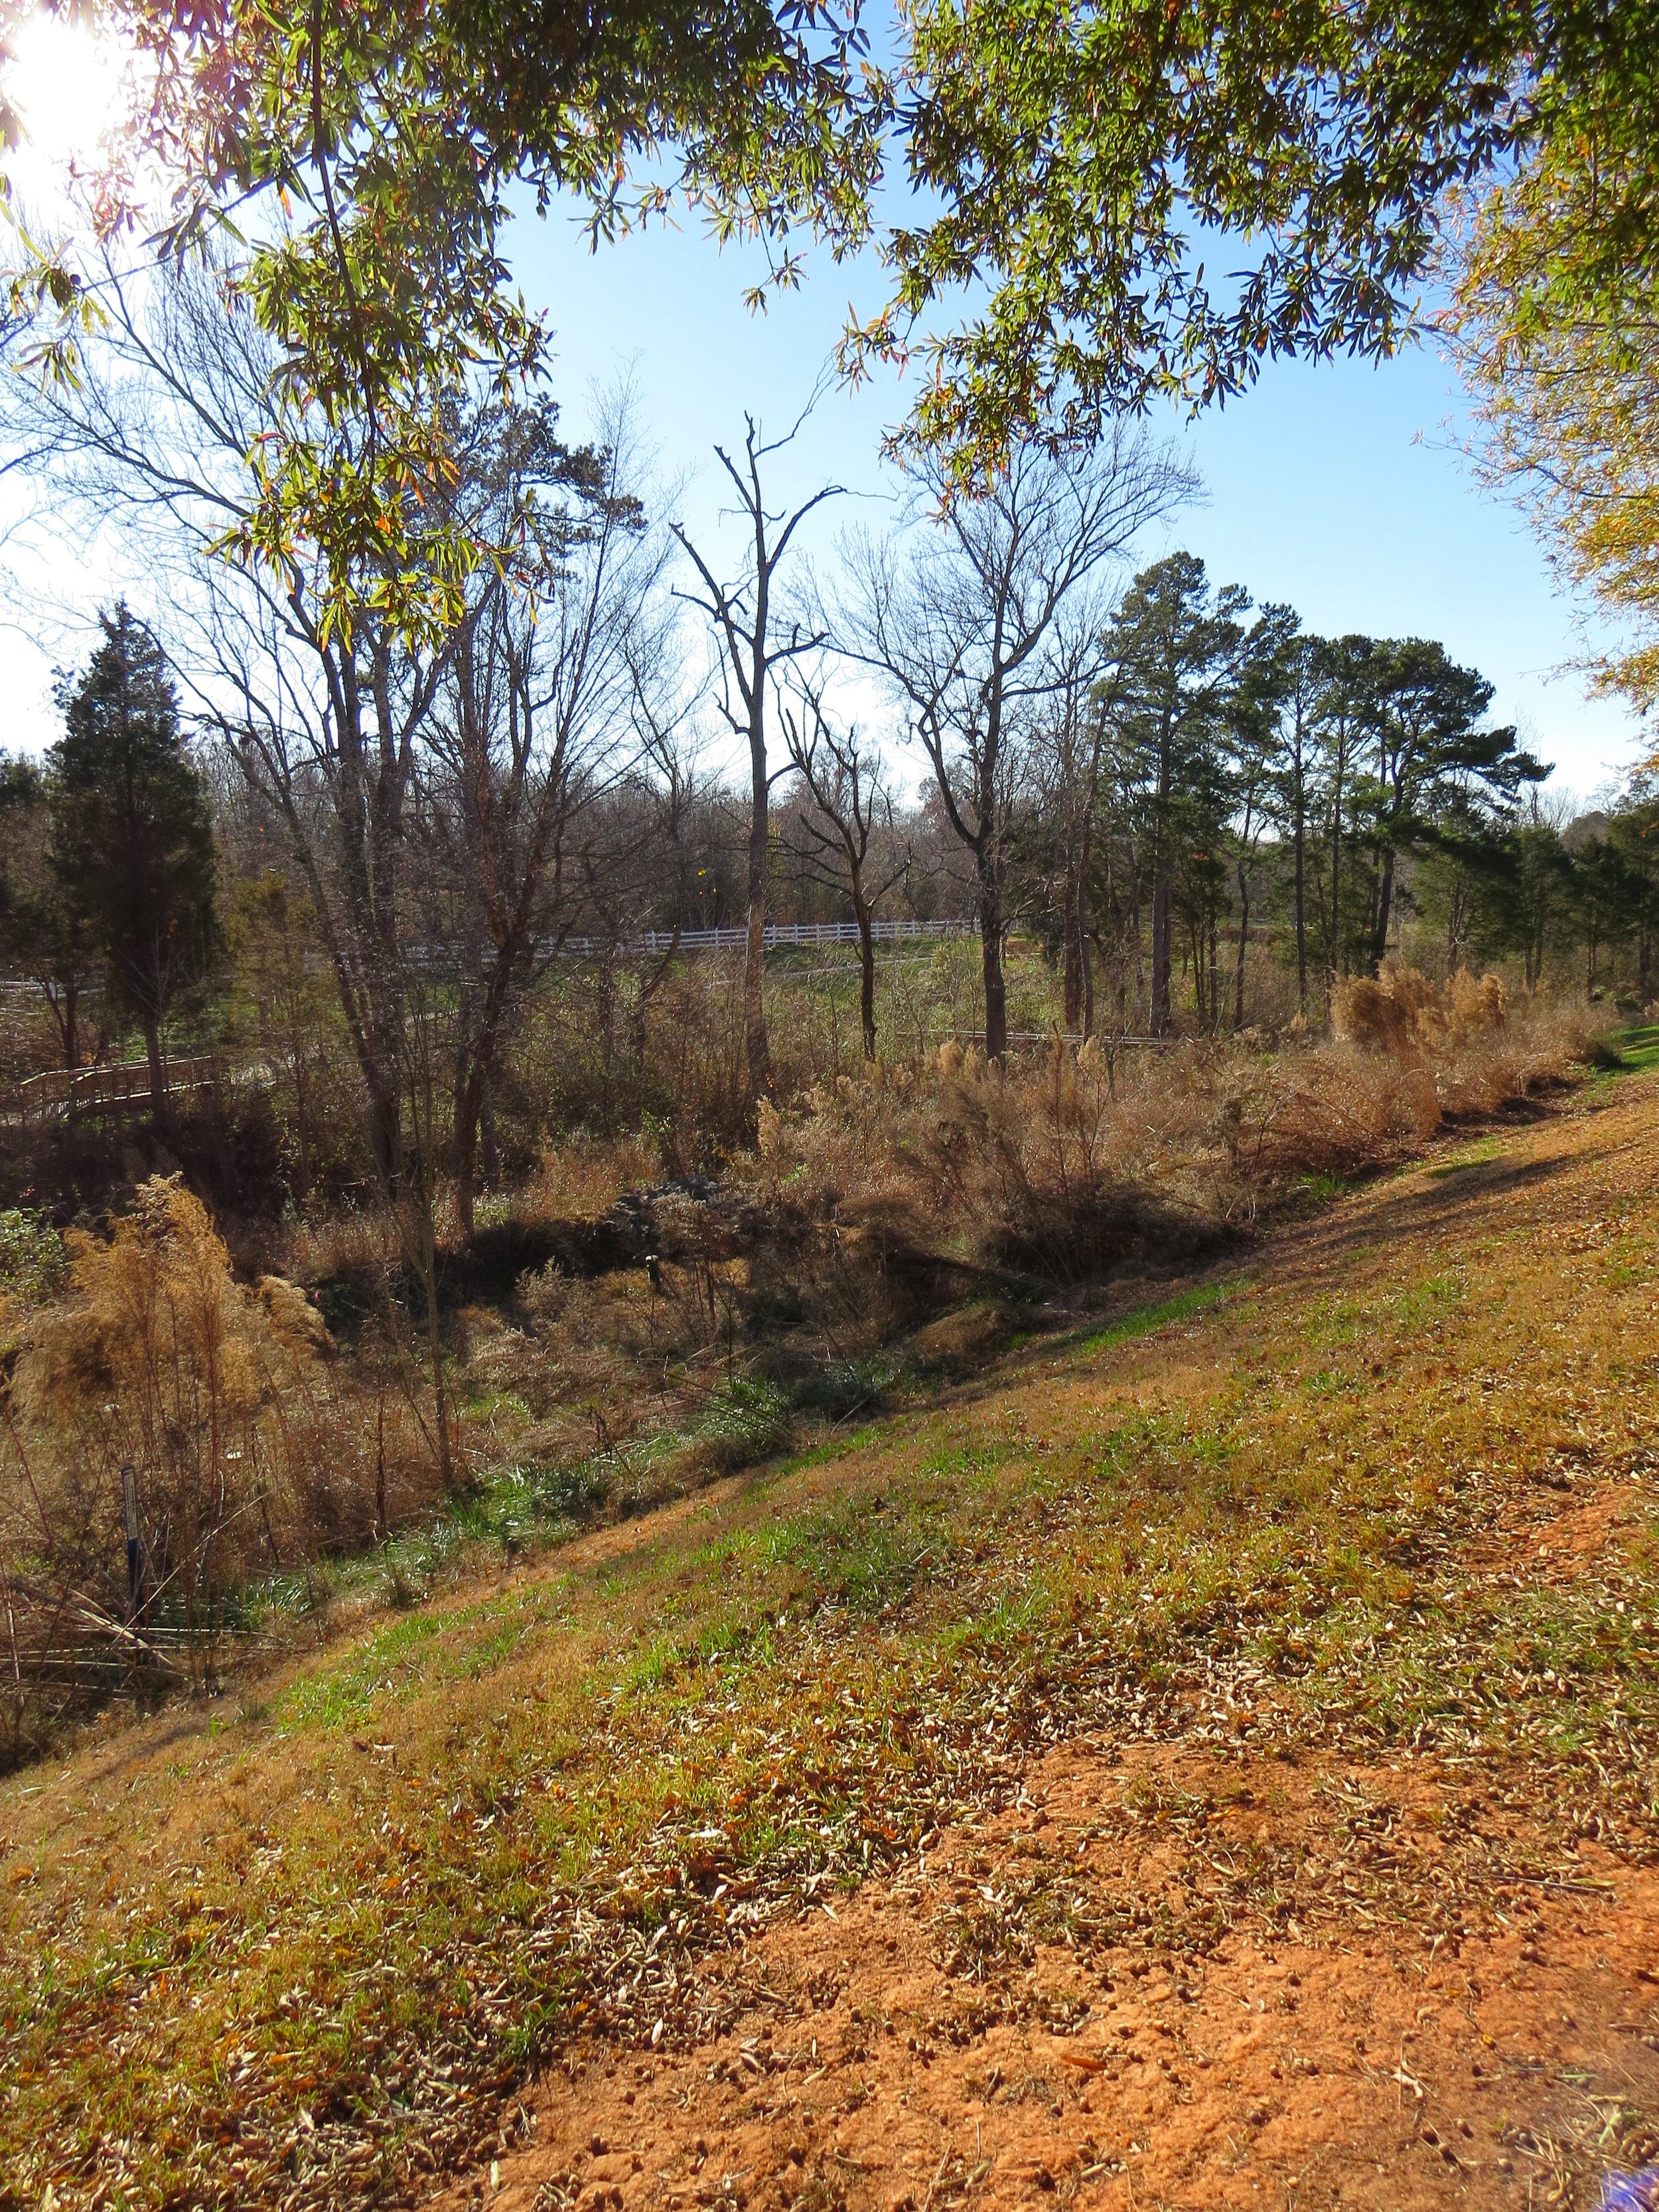 Monteith Park Mitigation Bank Mecklenburg County, North Carolina